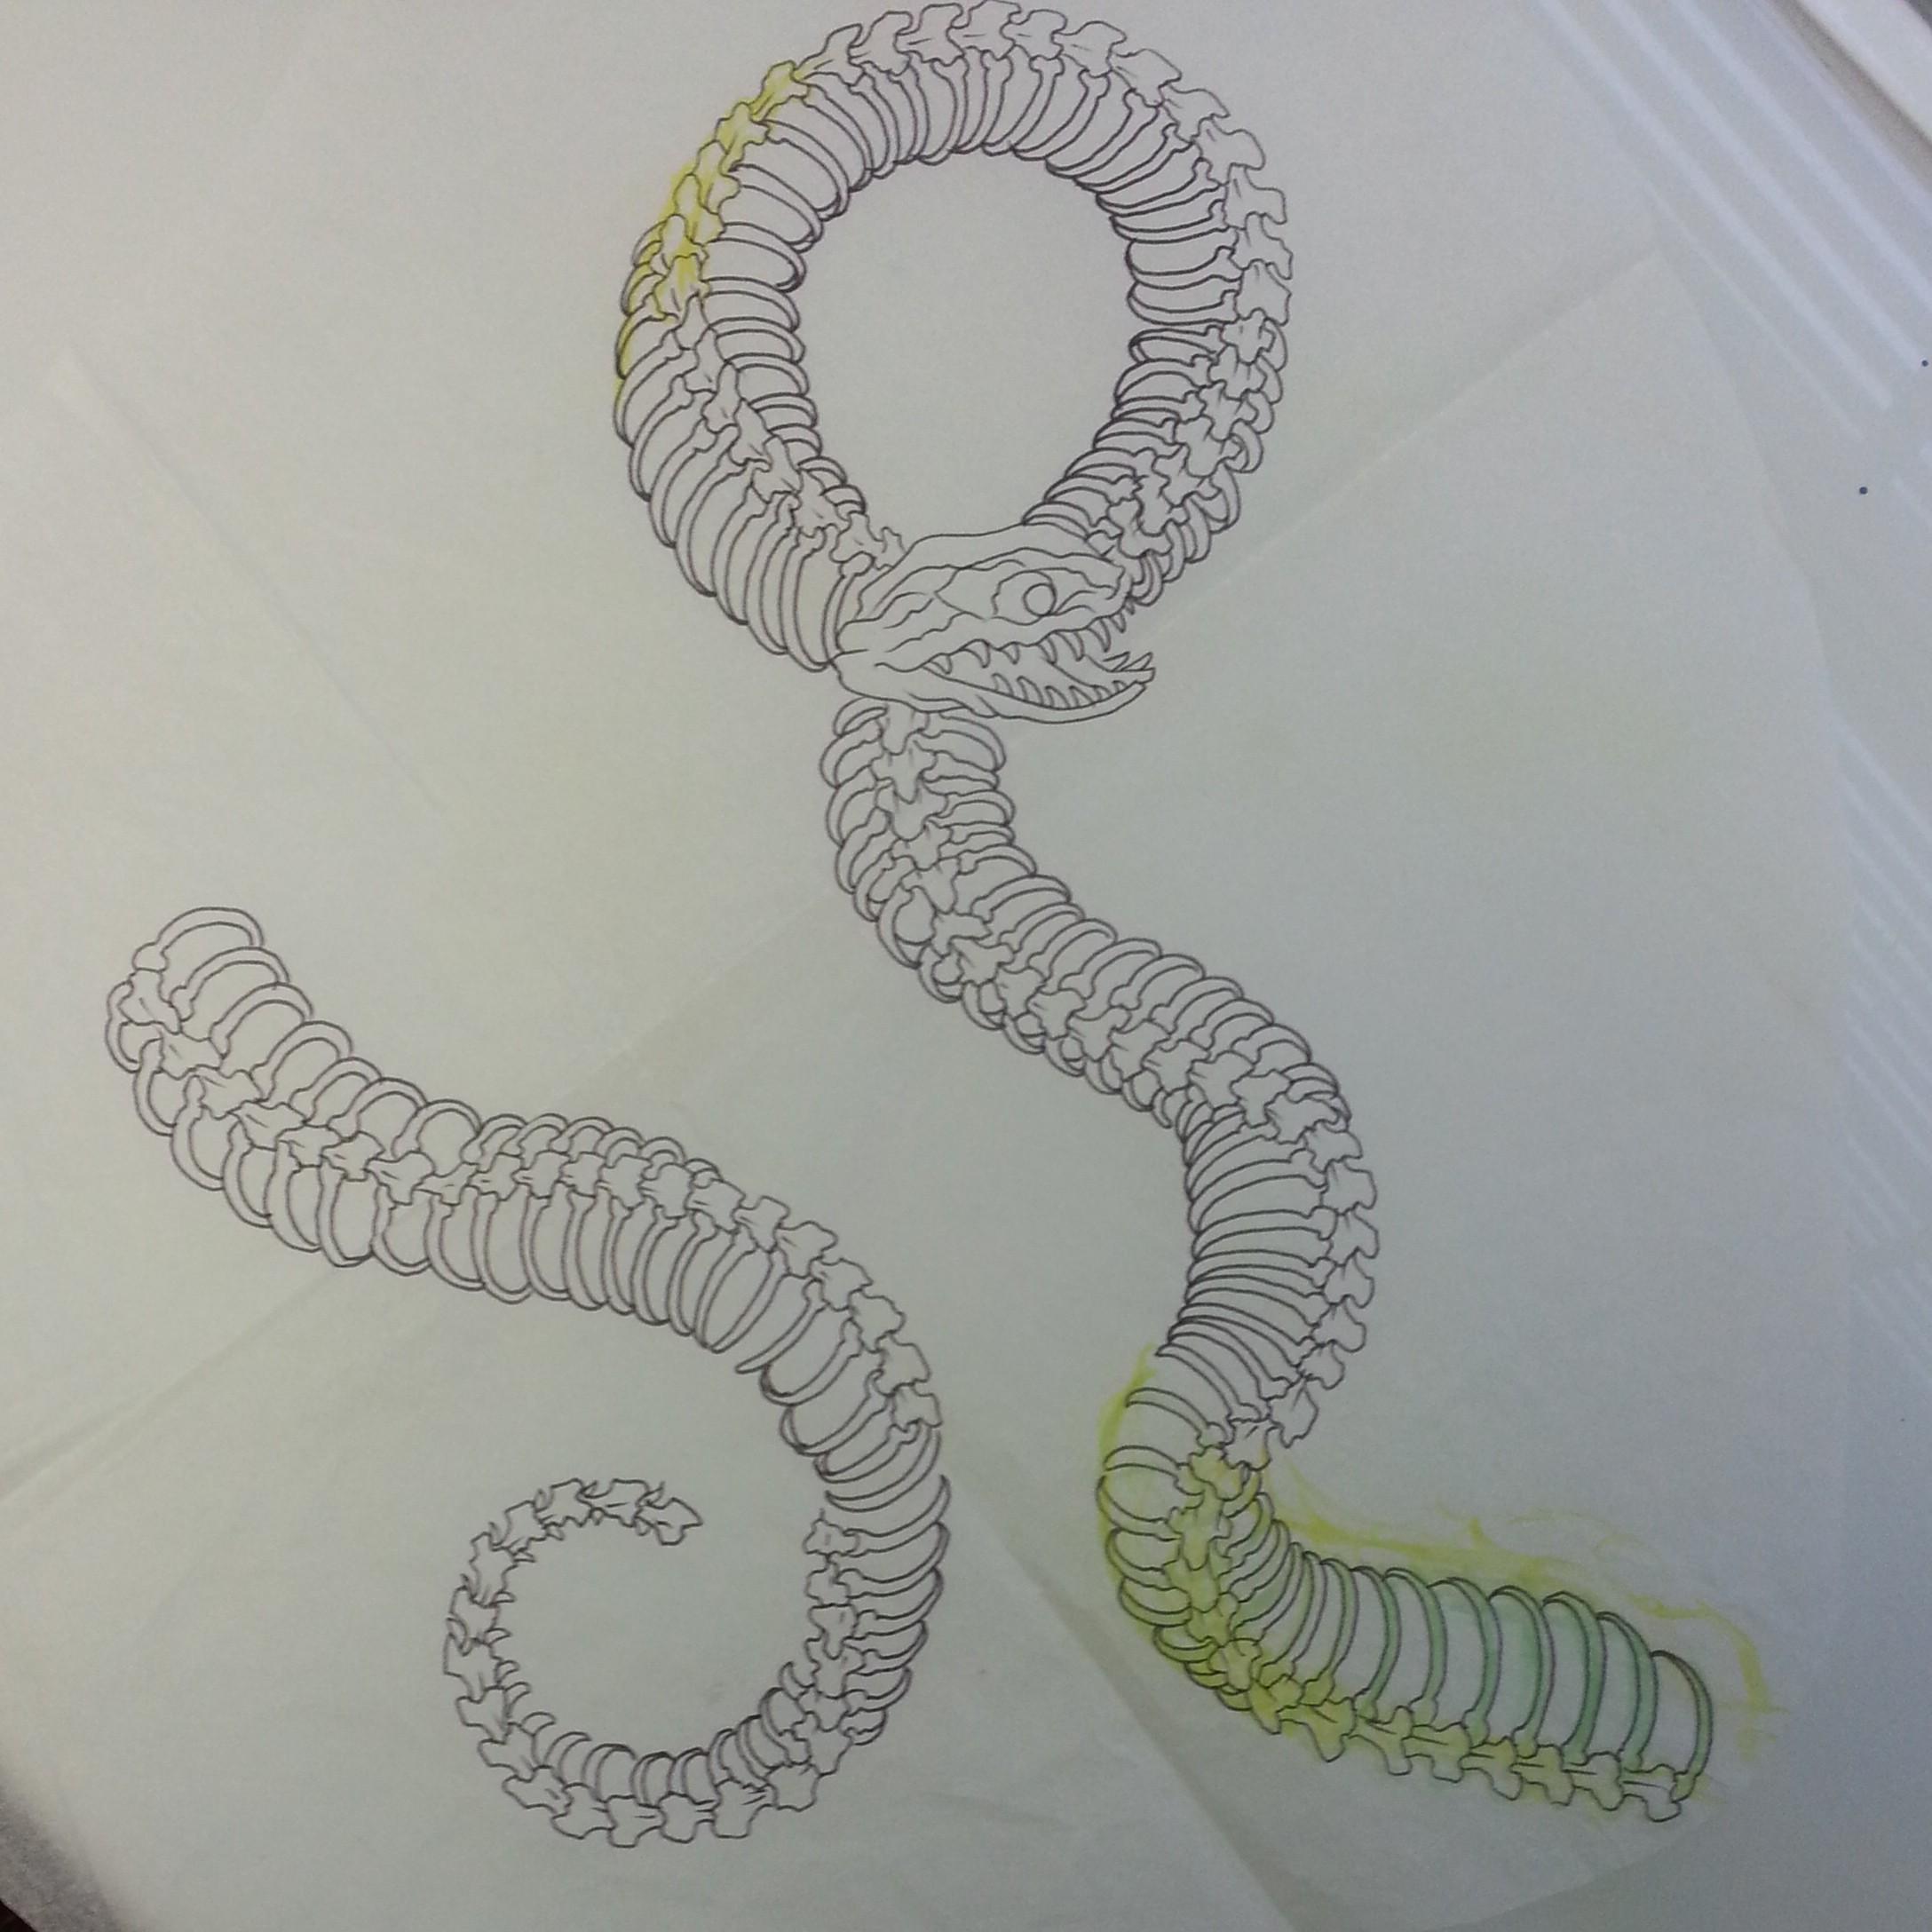 Tabernacle Tattoo Tampa Snake Bone Anatomy Sketch